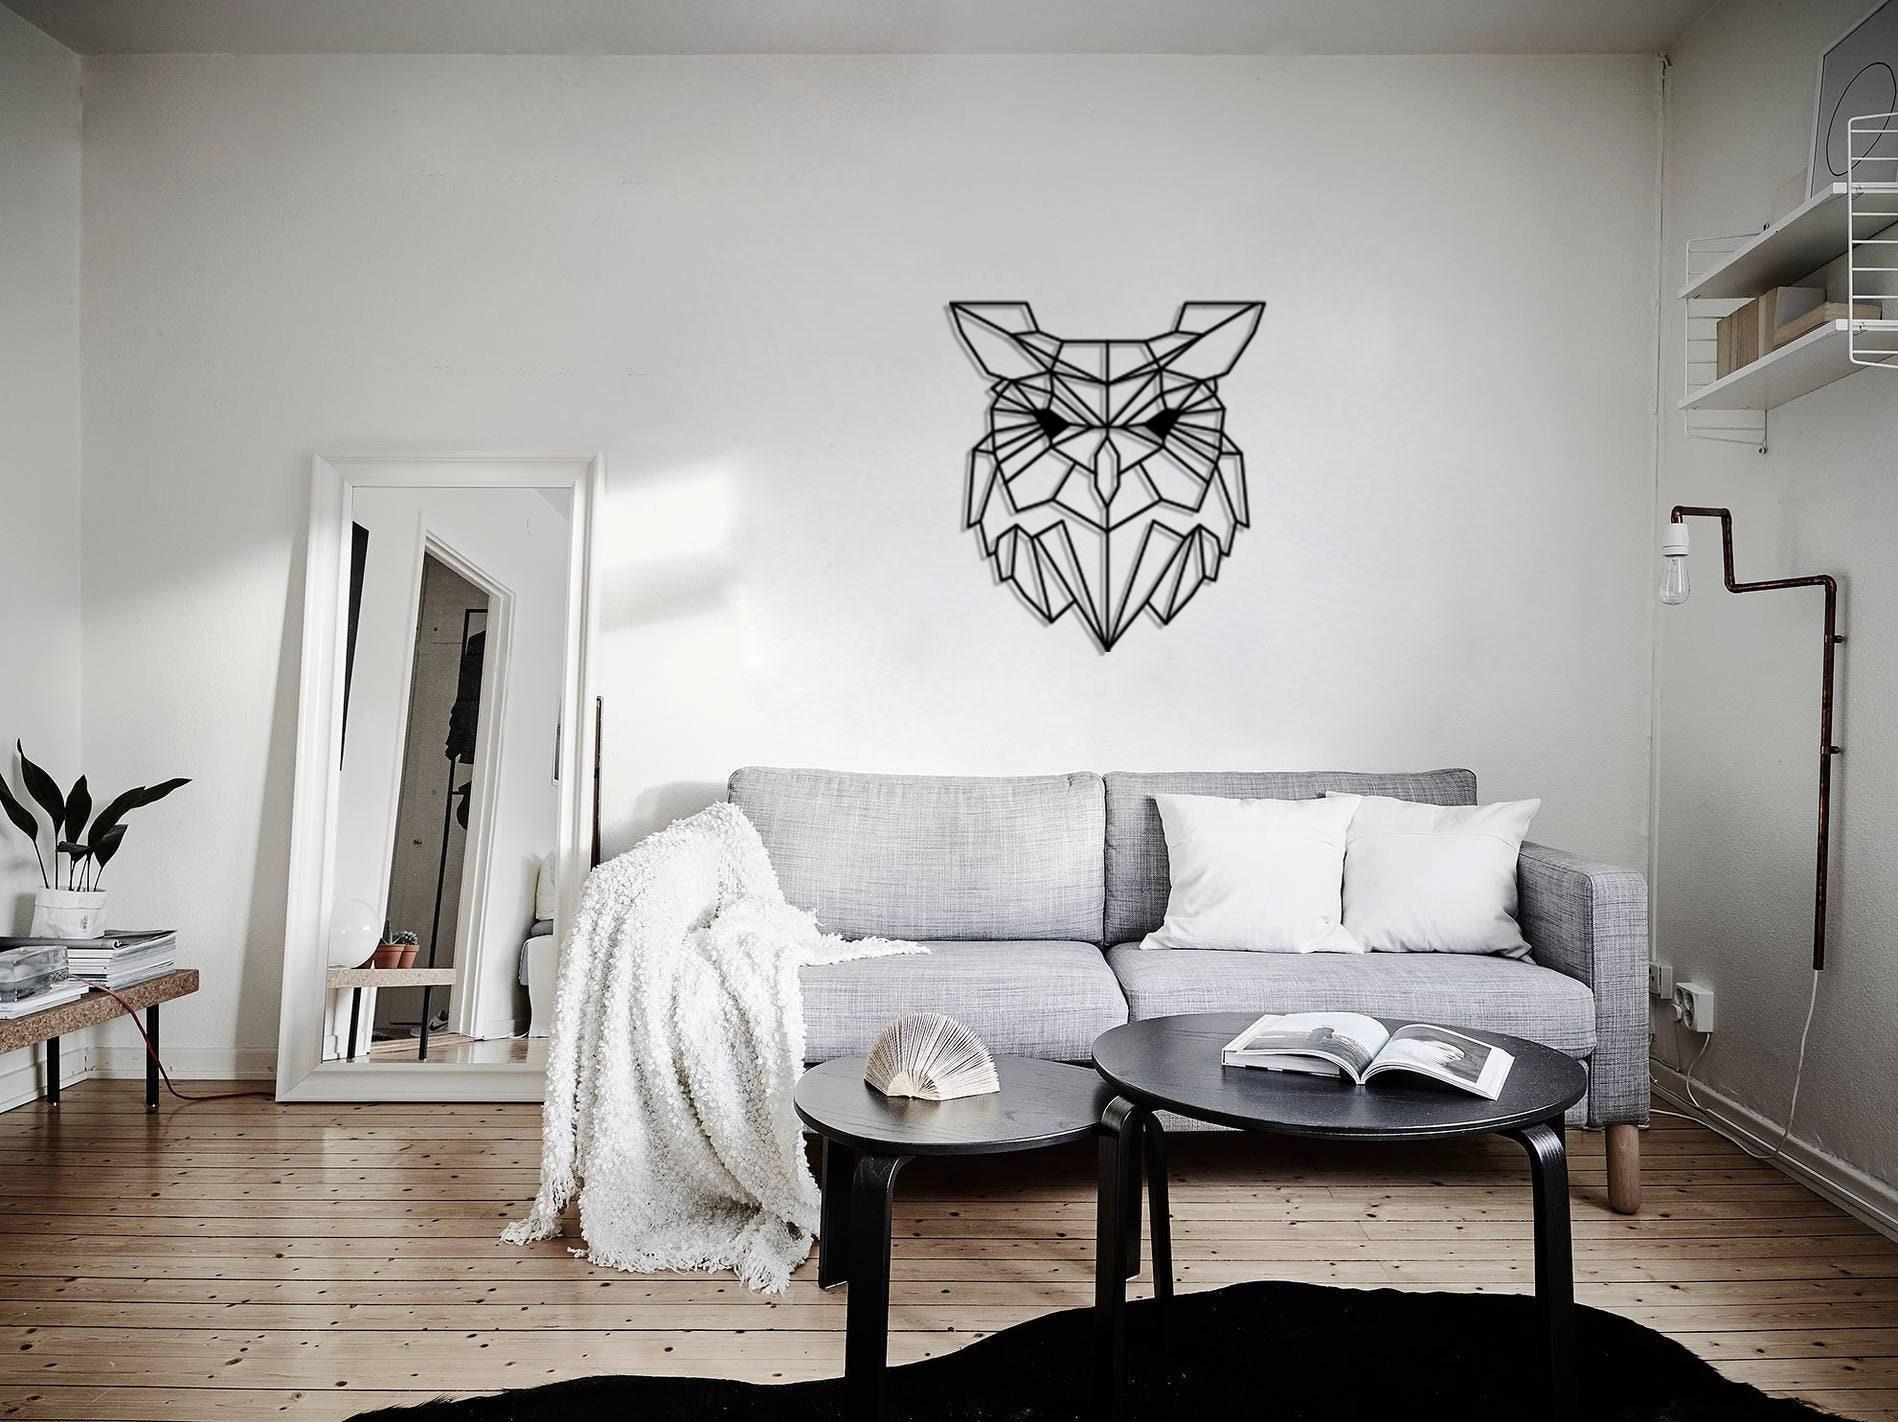 3d Wooden Owl Wall Decor Abstract Wall Art Bathroom Wall Art Artwork Home Wall Decor Ideas Modern Wood Wall Art Painted Wood Wall Art Black